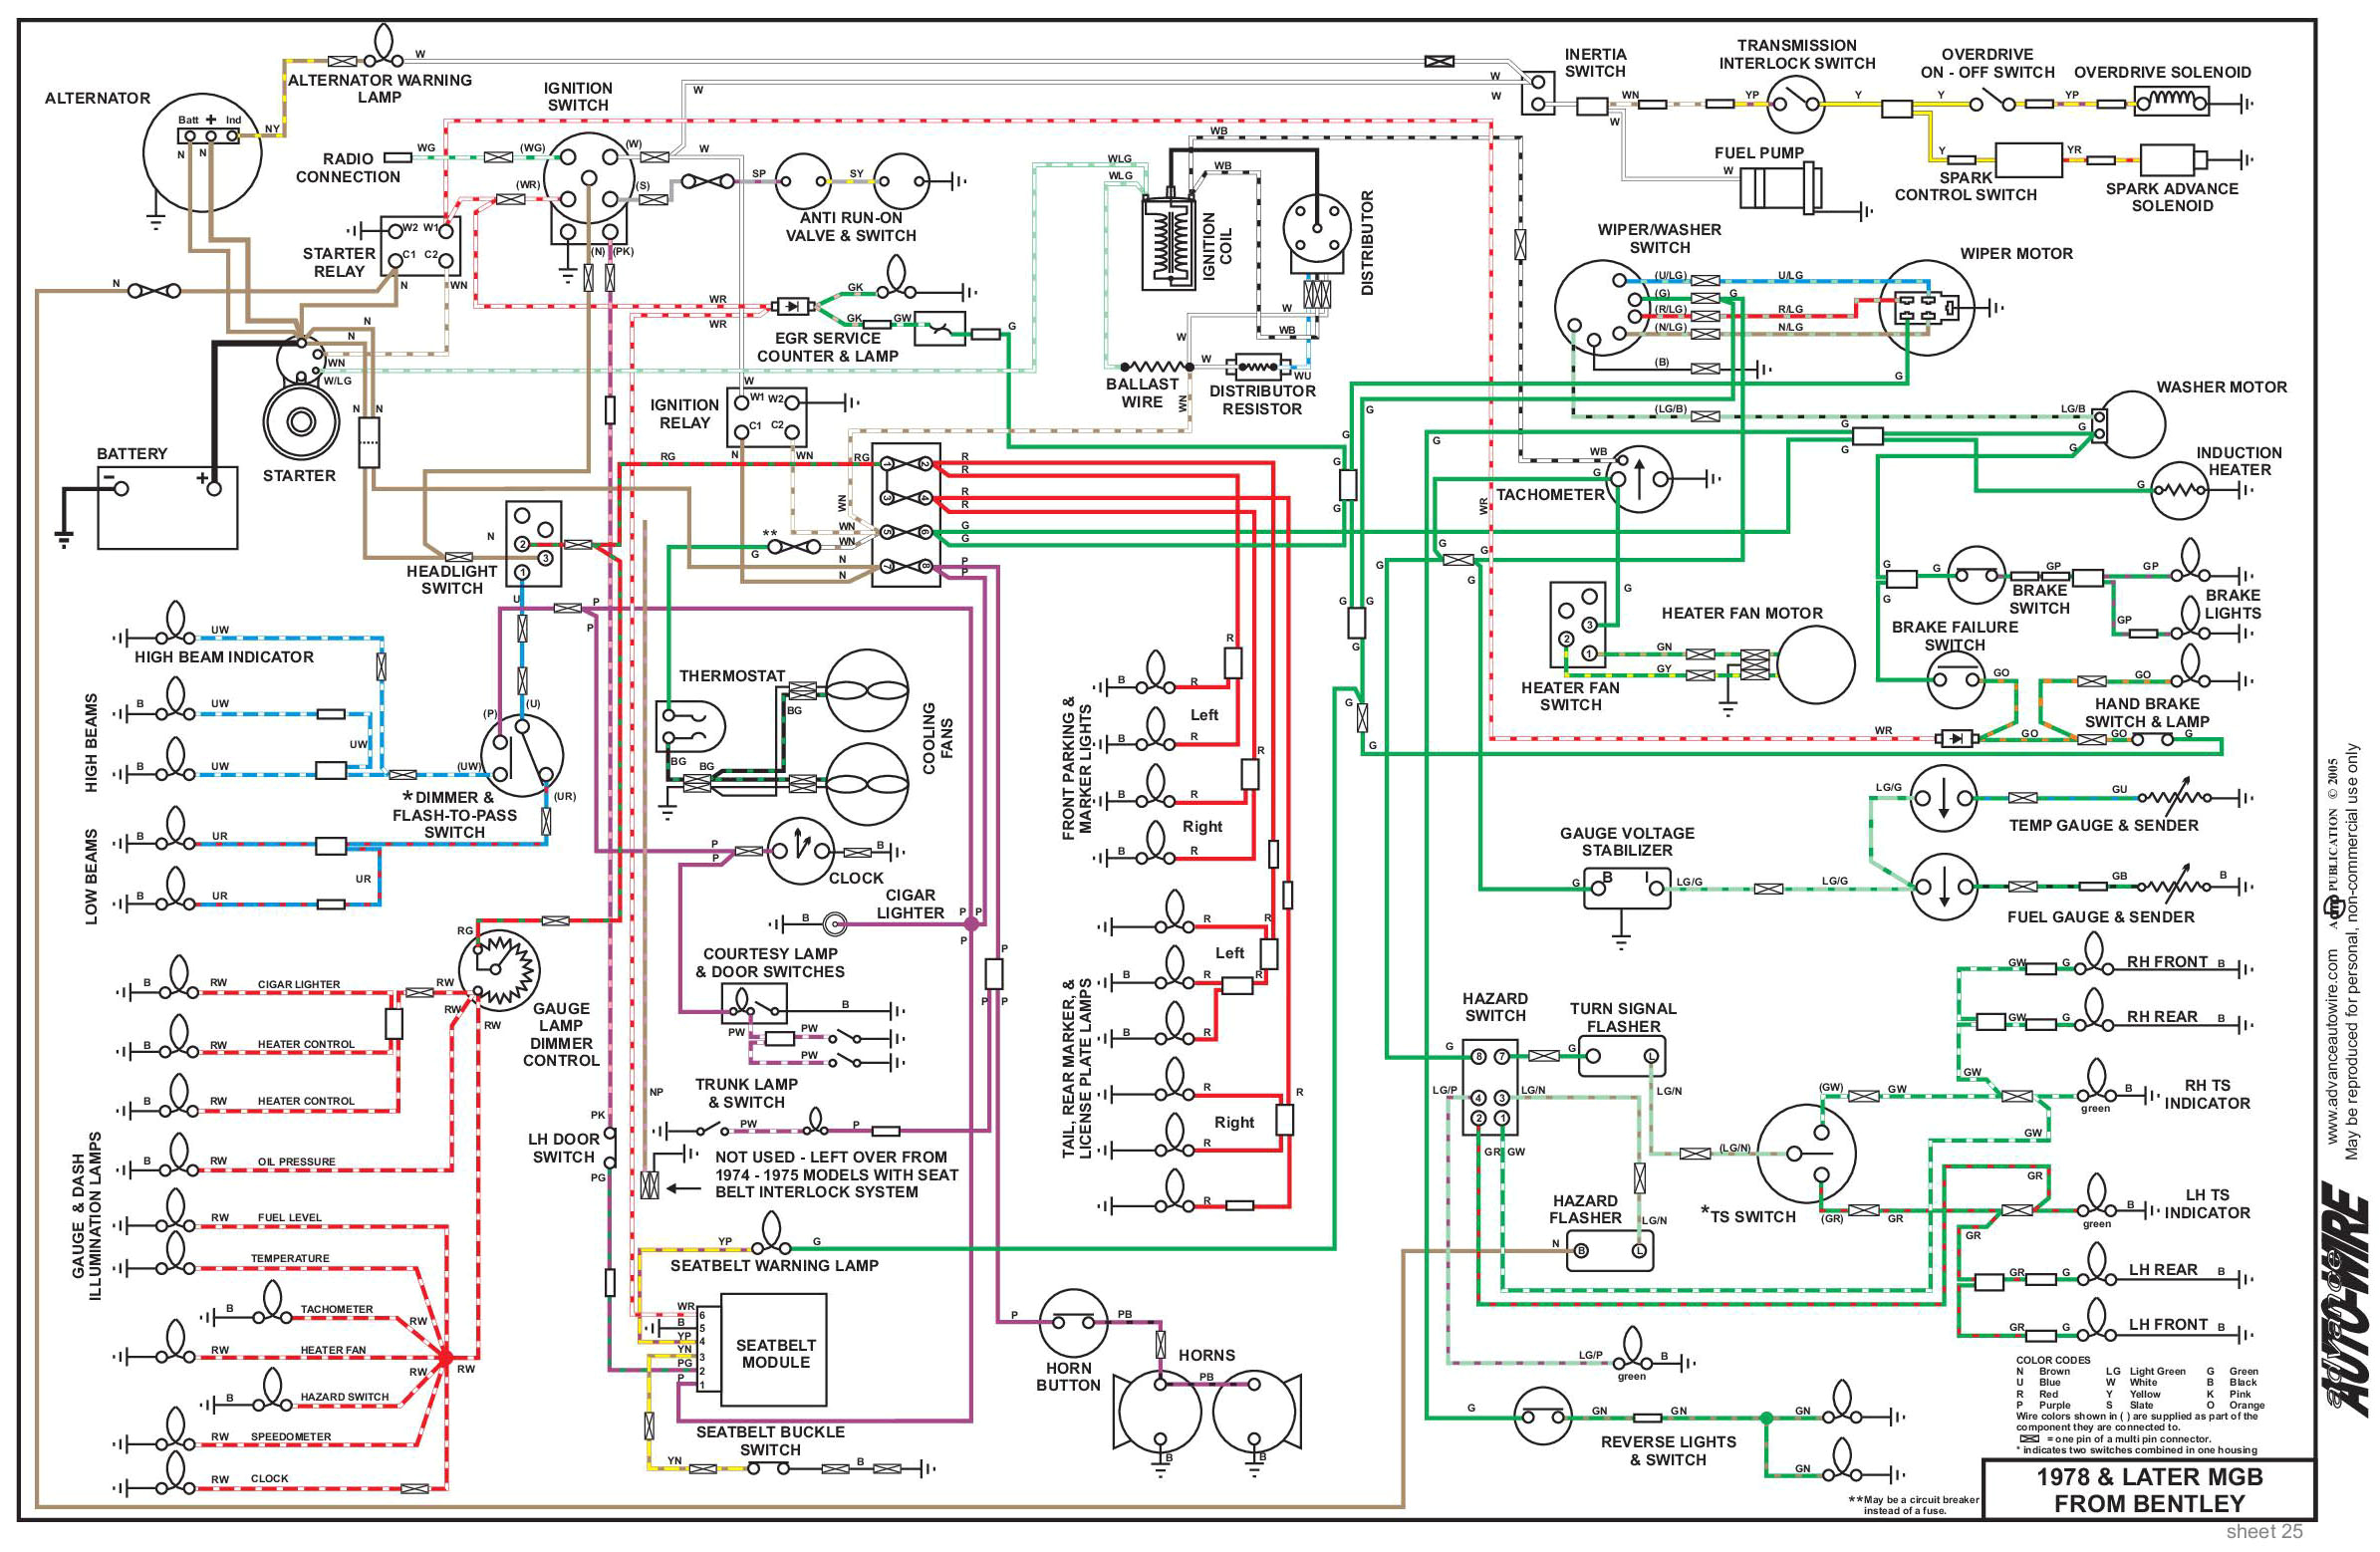 basic ignition wiring diagram 1979 mgb wiring diagram insider basic ignition wiring diagram 1979 mgb